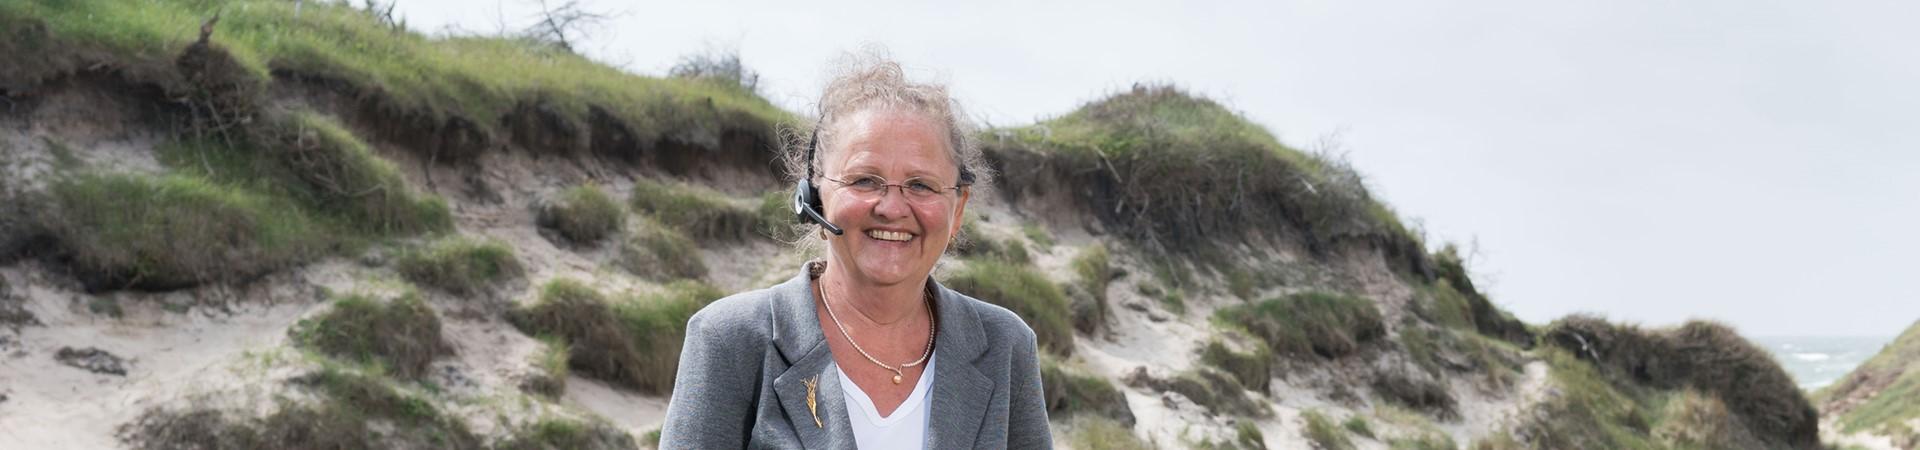 Spørgsmål og svar - Sønderhå-Hørsted Sparekasse